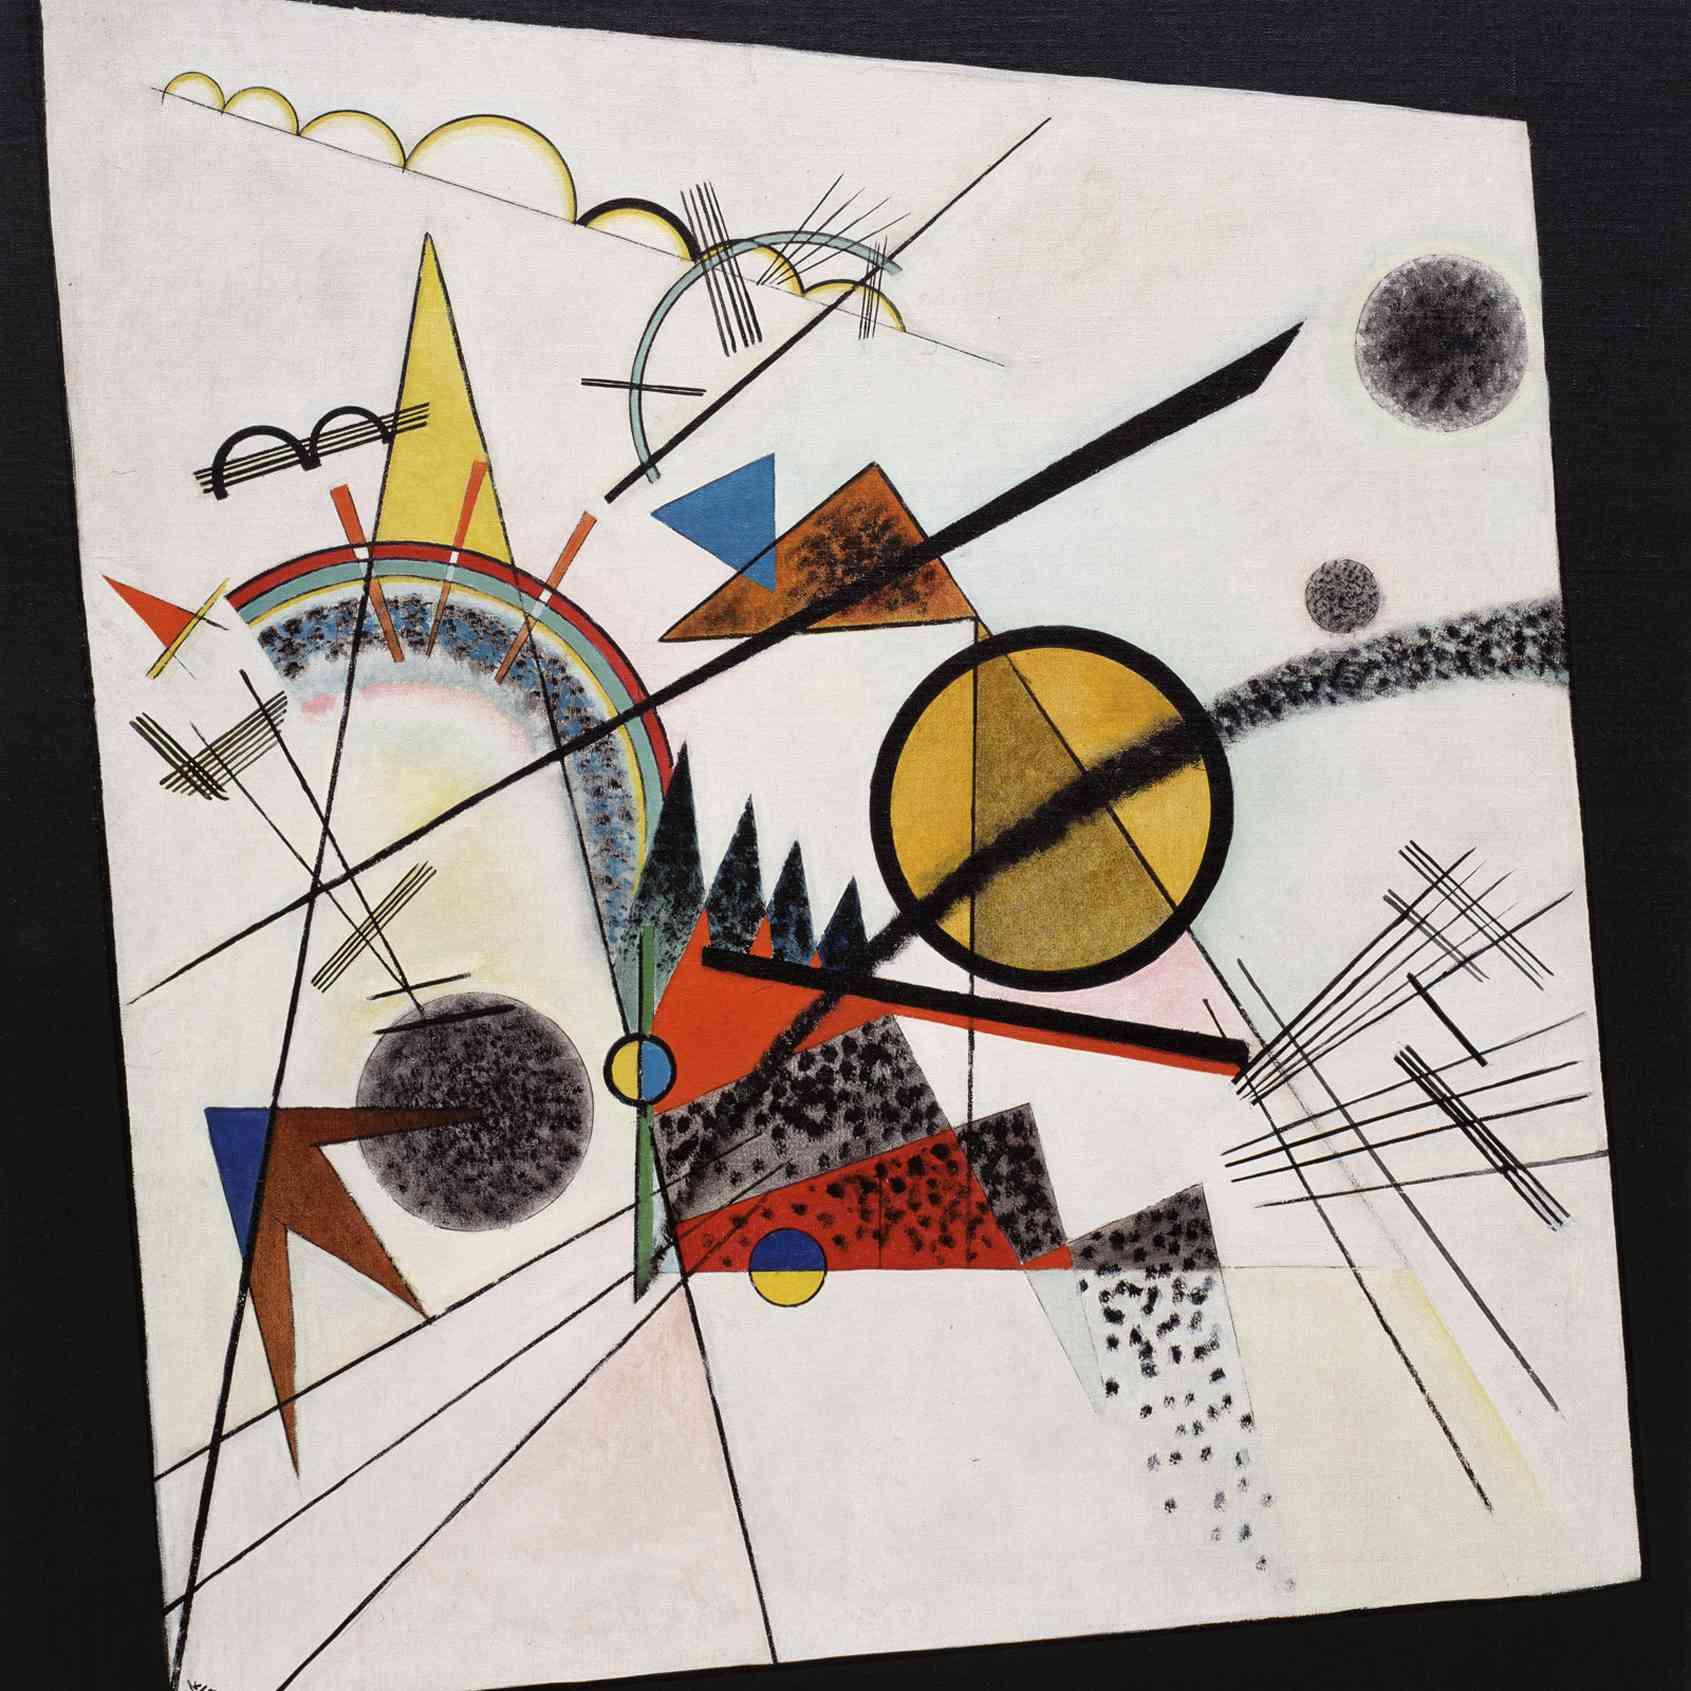 Wassily Kandinsky (Russian, 1866-1944) Wassily Kandinsky (Russian, 1866-1944). In the Black Square (Im schwarzen Viereck), June 1923. Oil on canvas. 38 3/8 x 36 5/8 in. (97.5 x 93 cm). Solomon R. Guggenheim Founding Collection, By gift 37.254. Solomon R. Guggenheim Museum, New York.